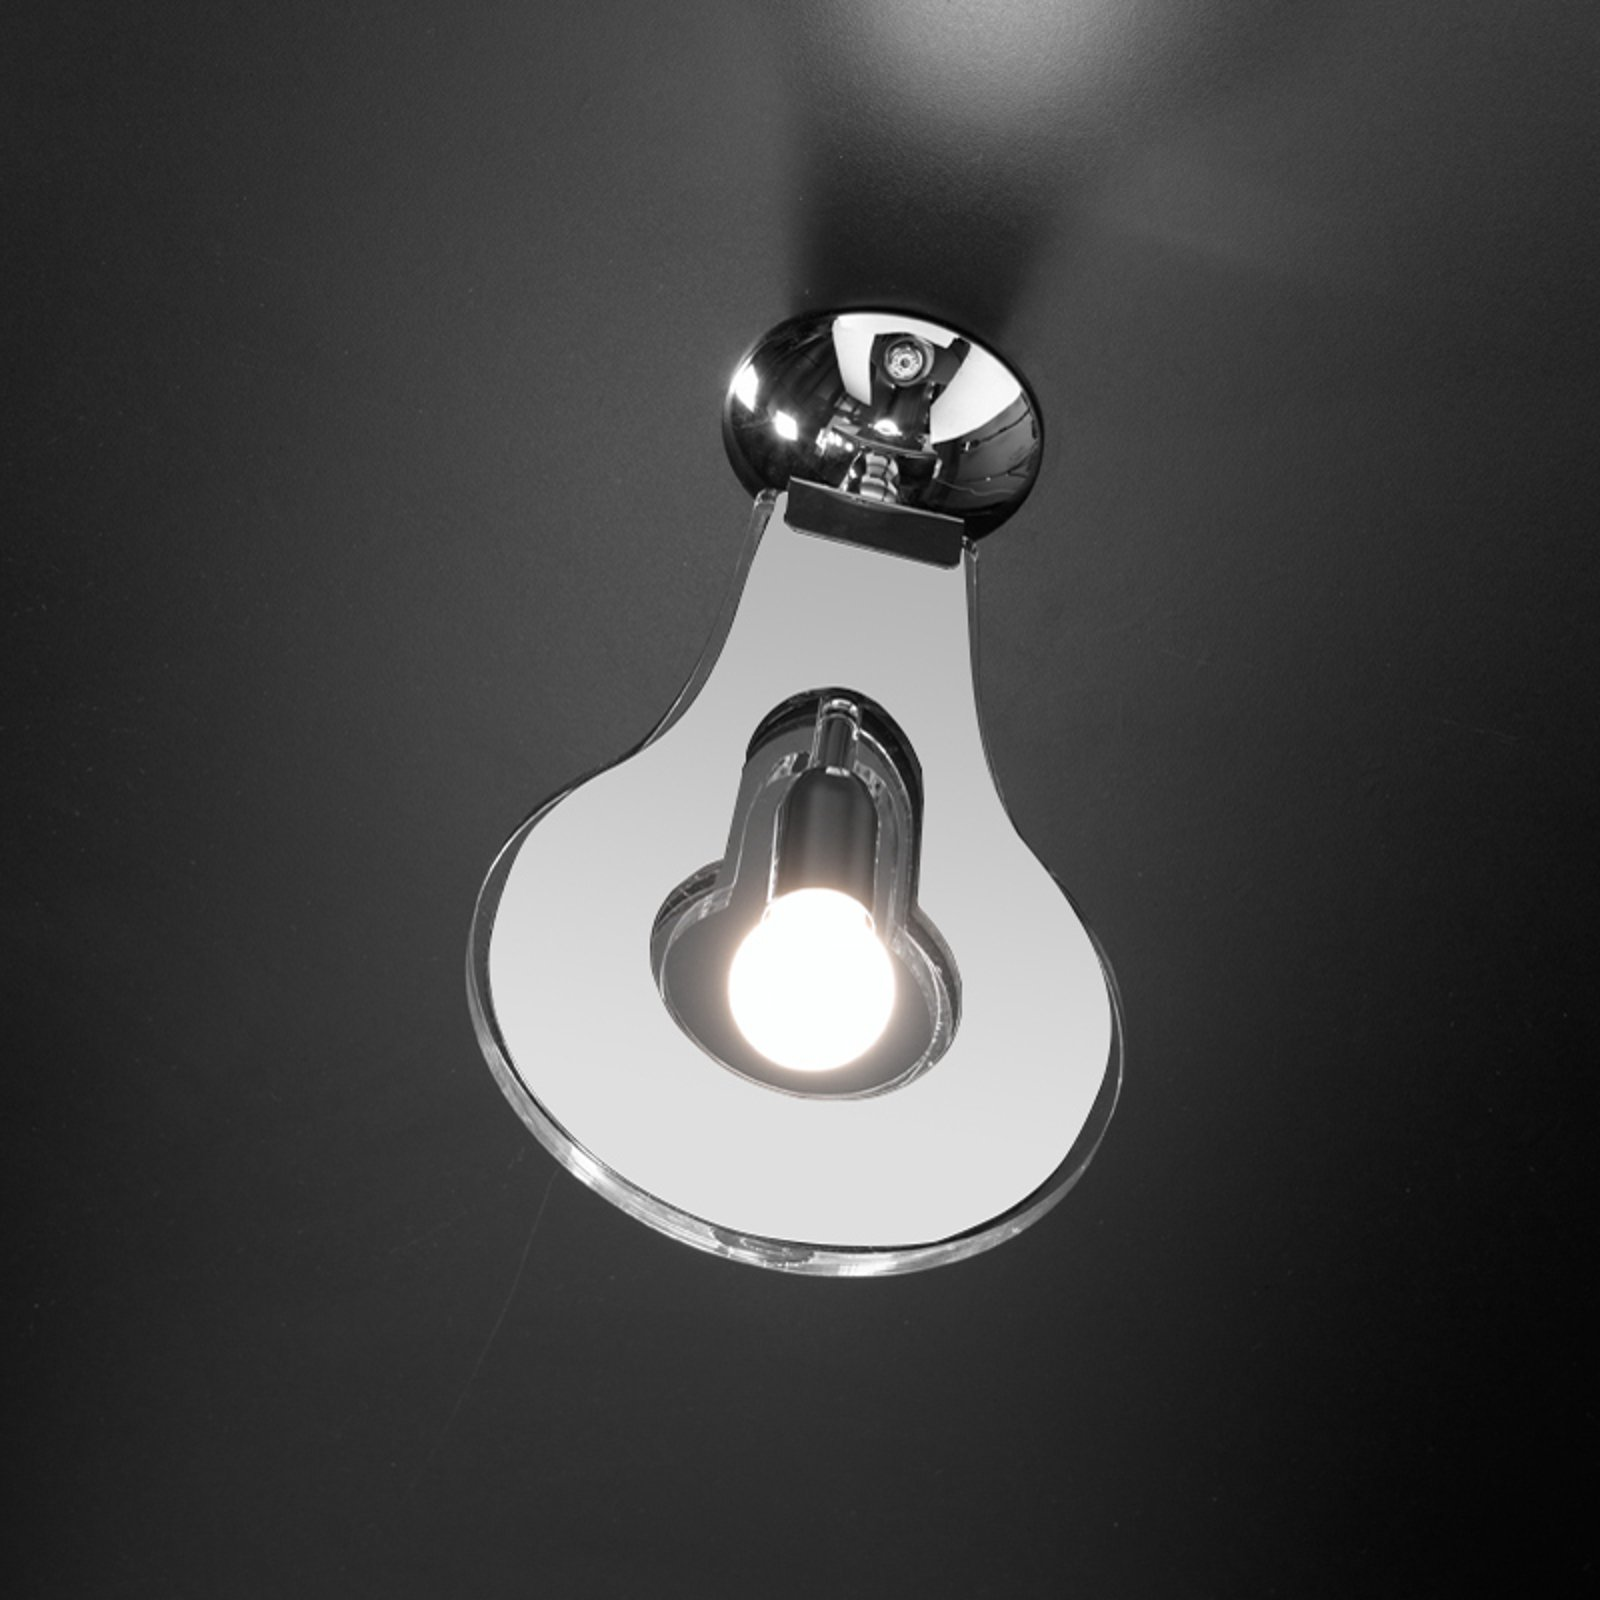 Trendy taklampe Flat hvit